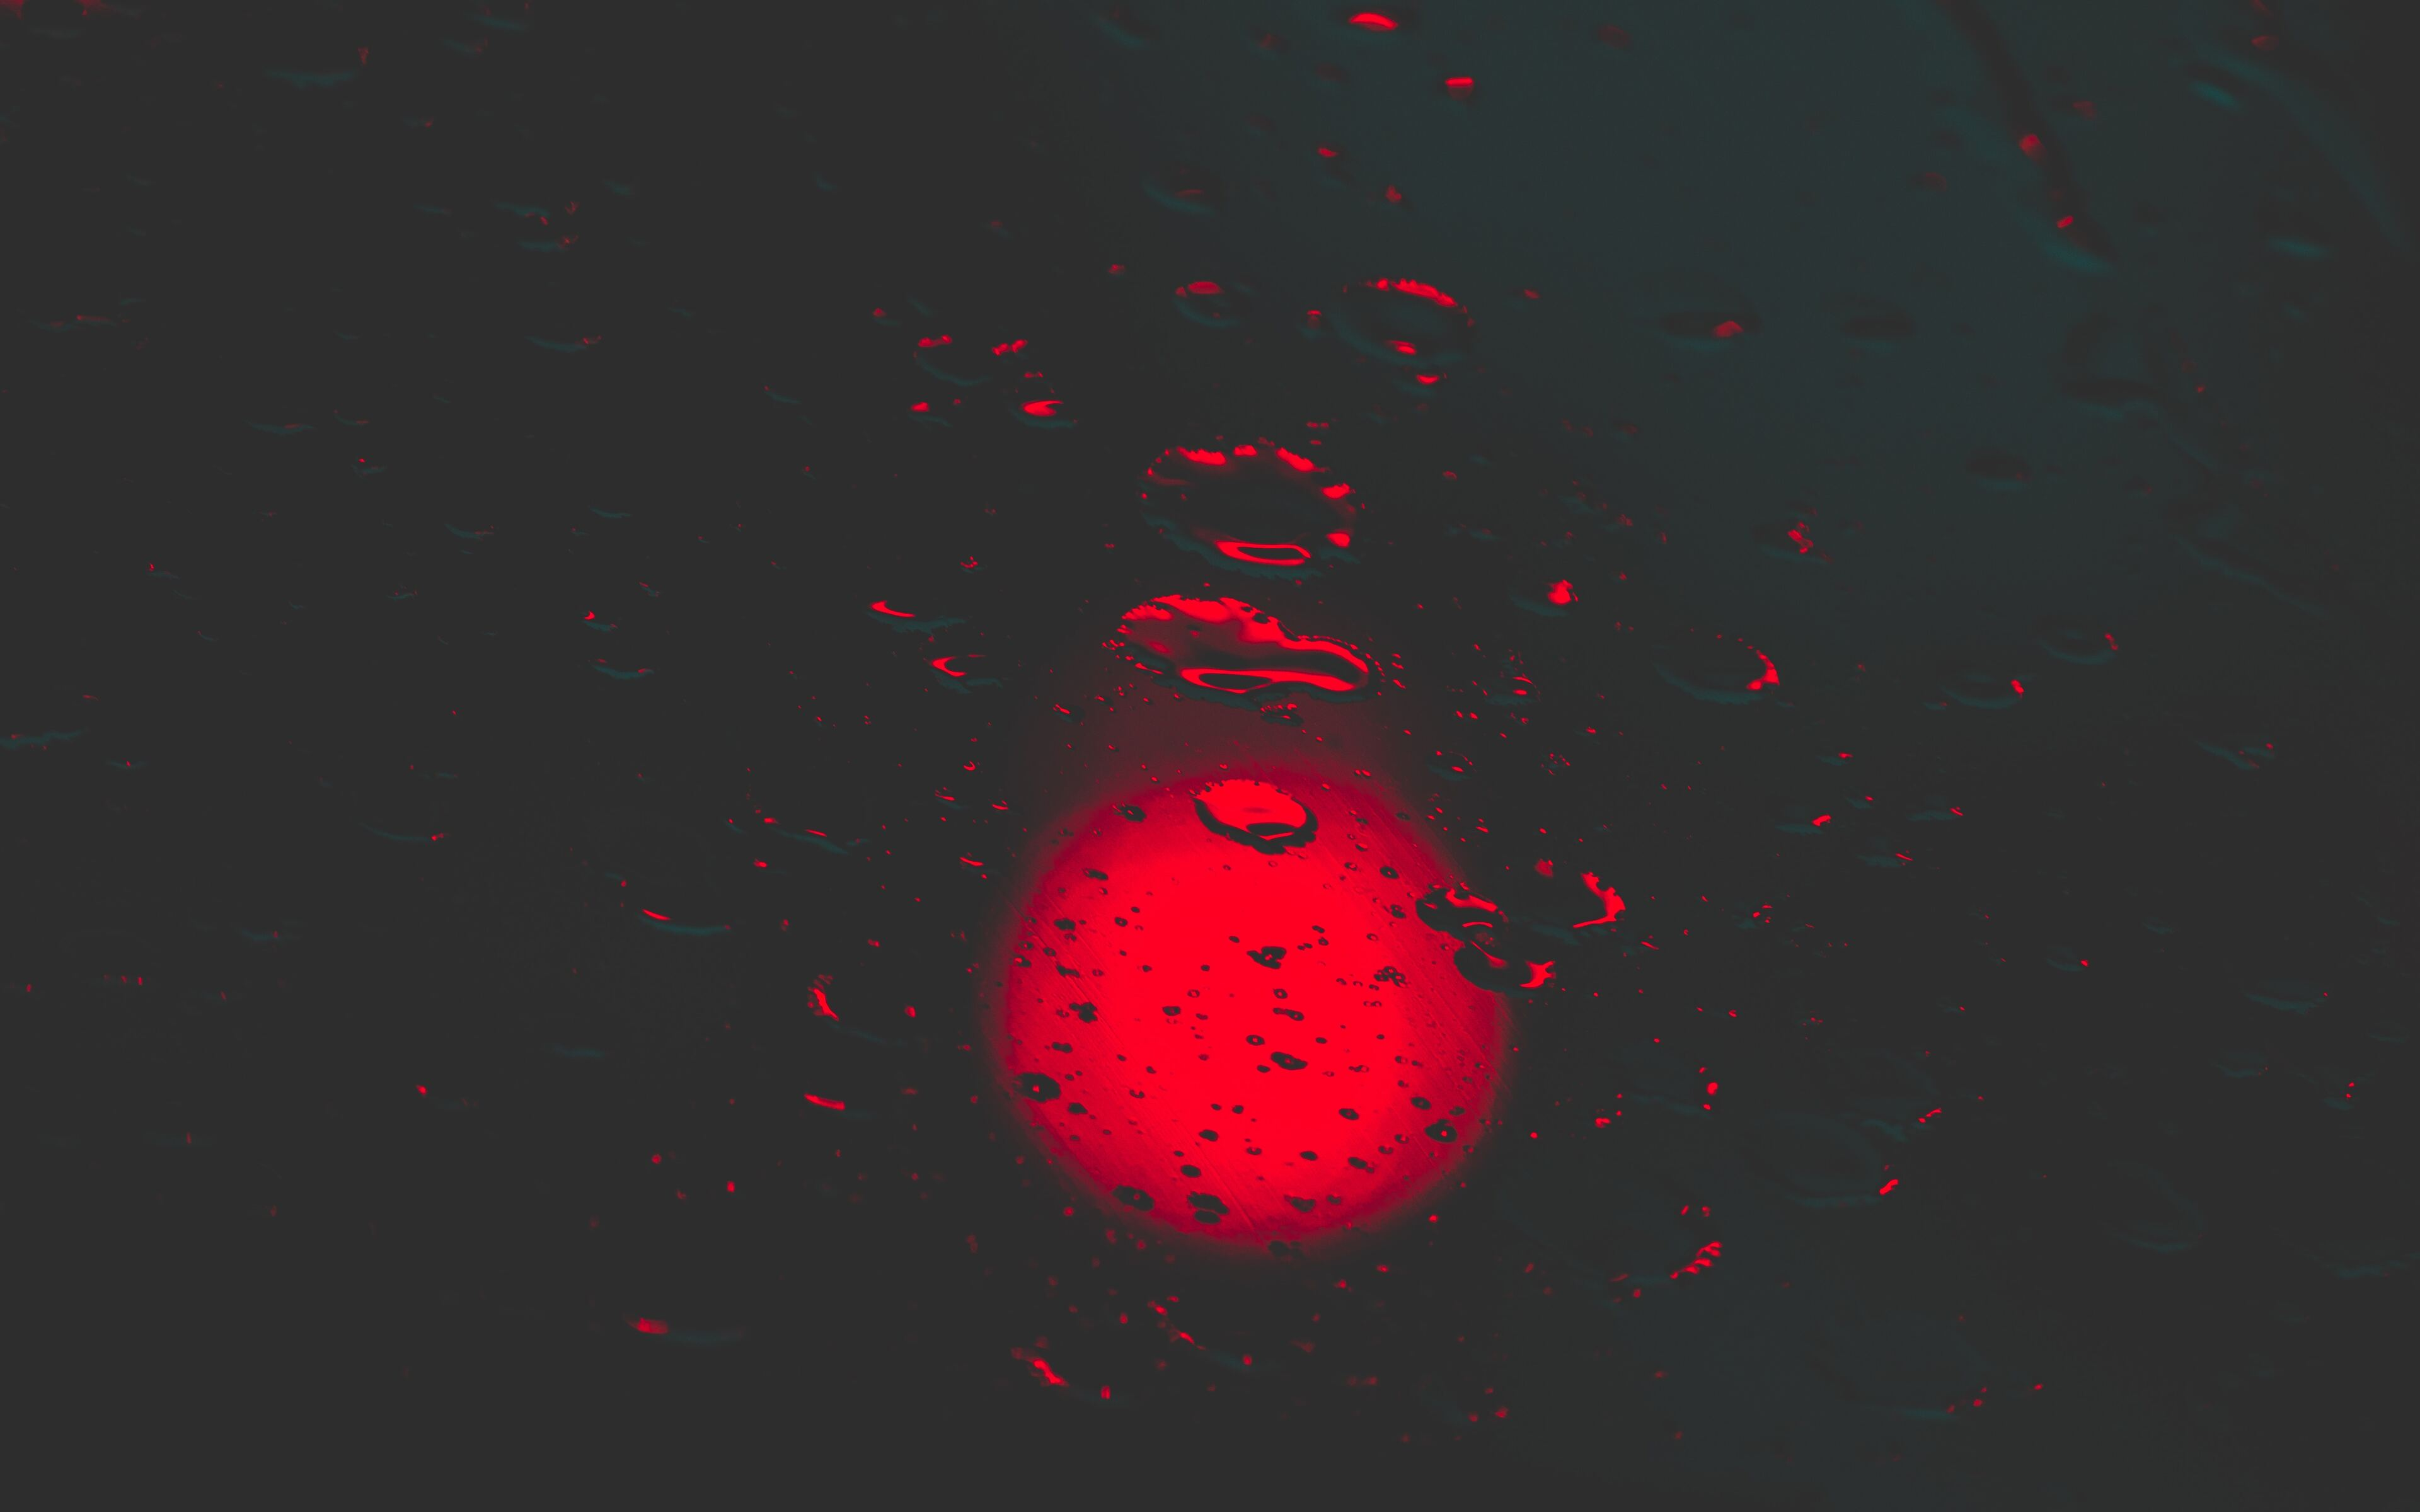 red-lights-bokeh-circle-reflection-dark-background-5k-ws.jpg